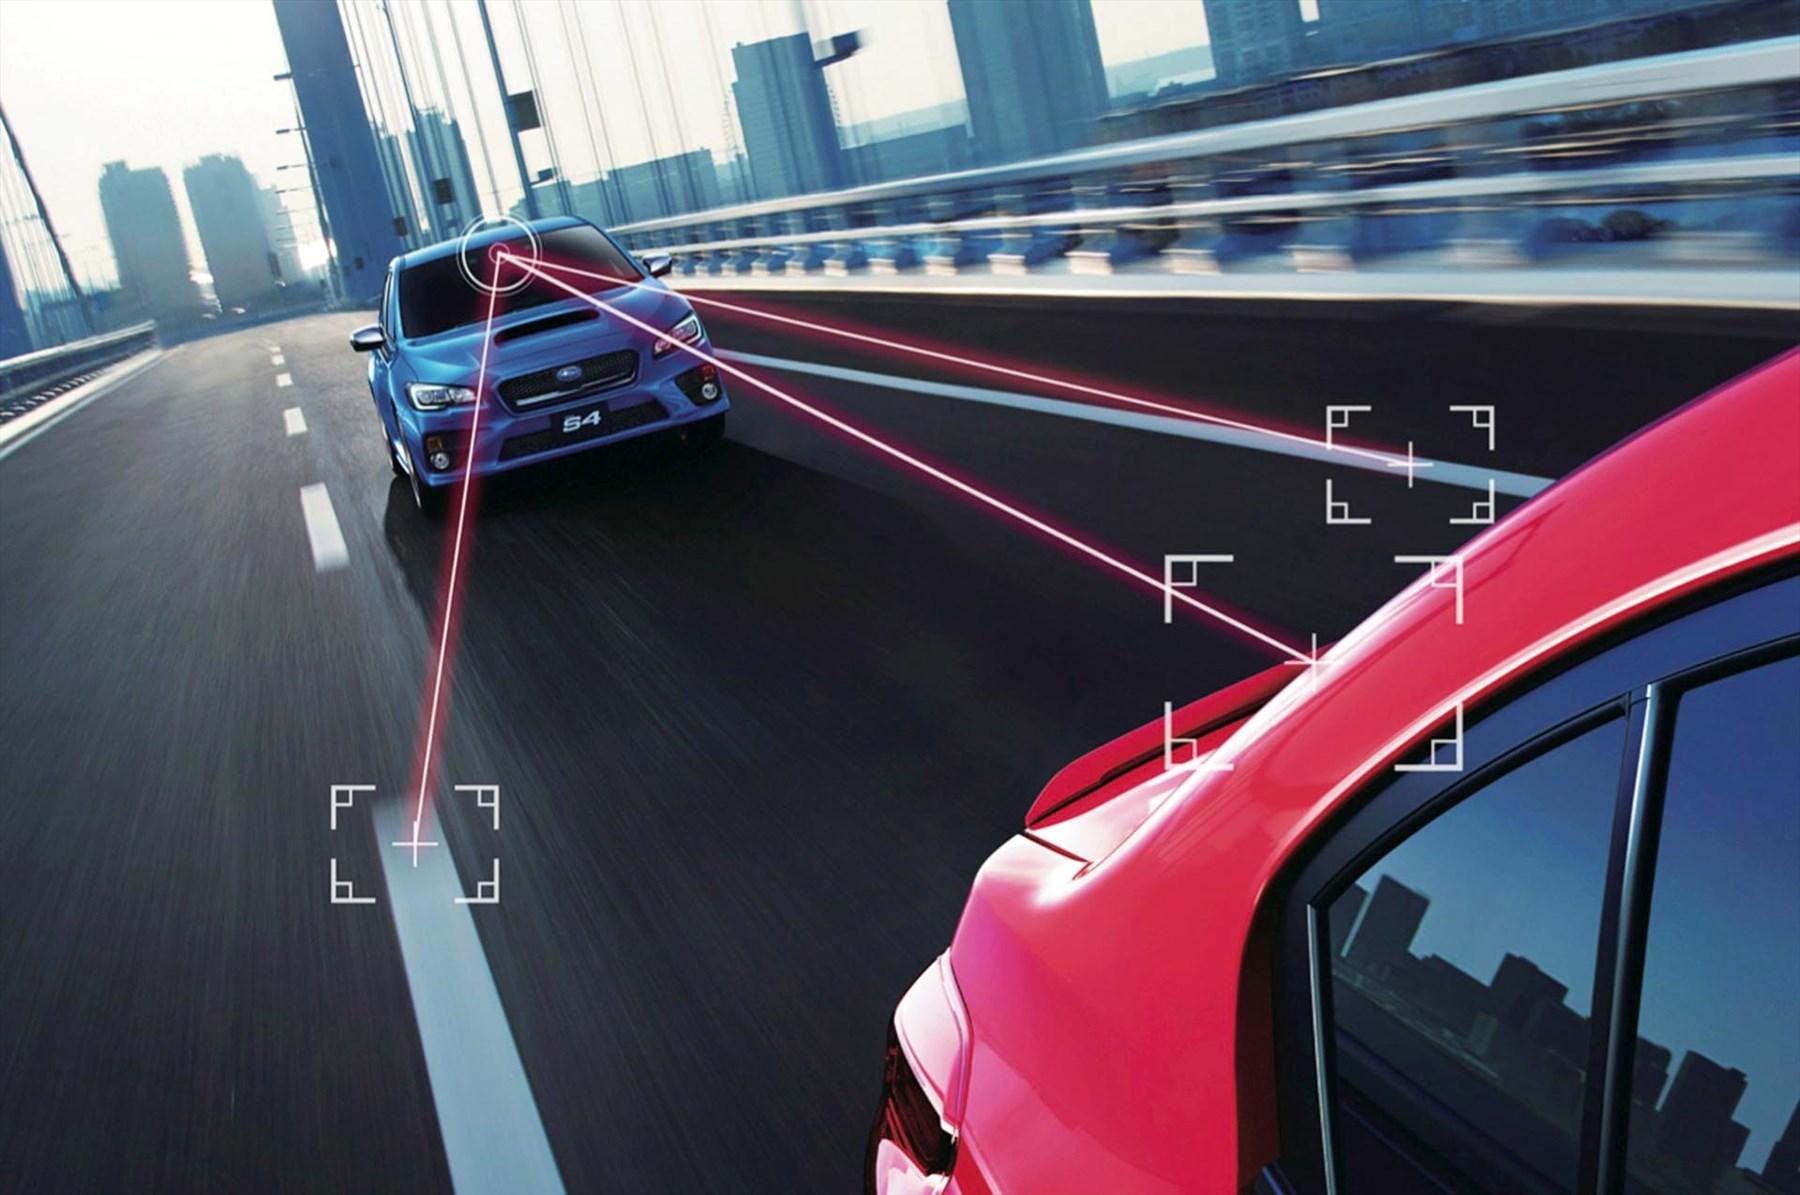 subaru-eyesight-lane-keeping-and-collision-avoidance-subaru_1800x1800